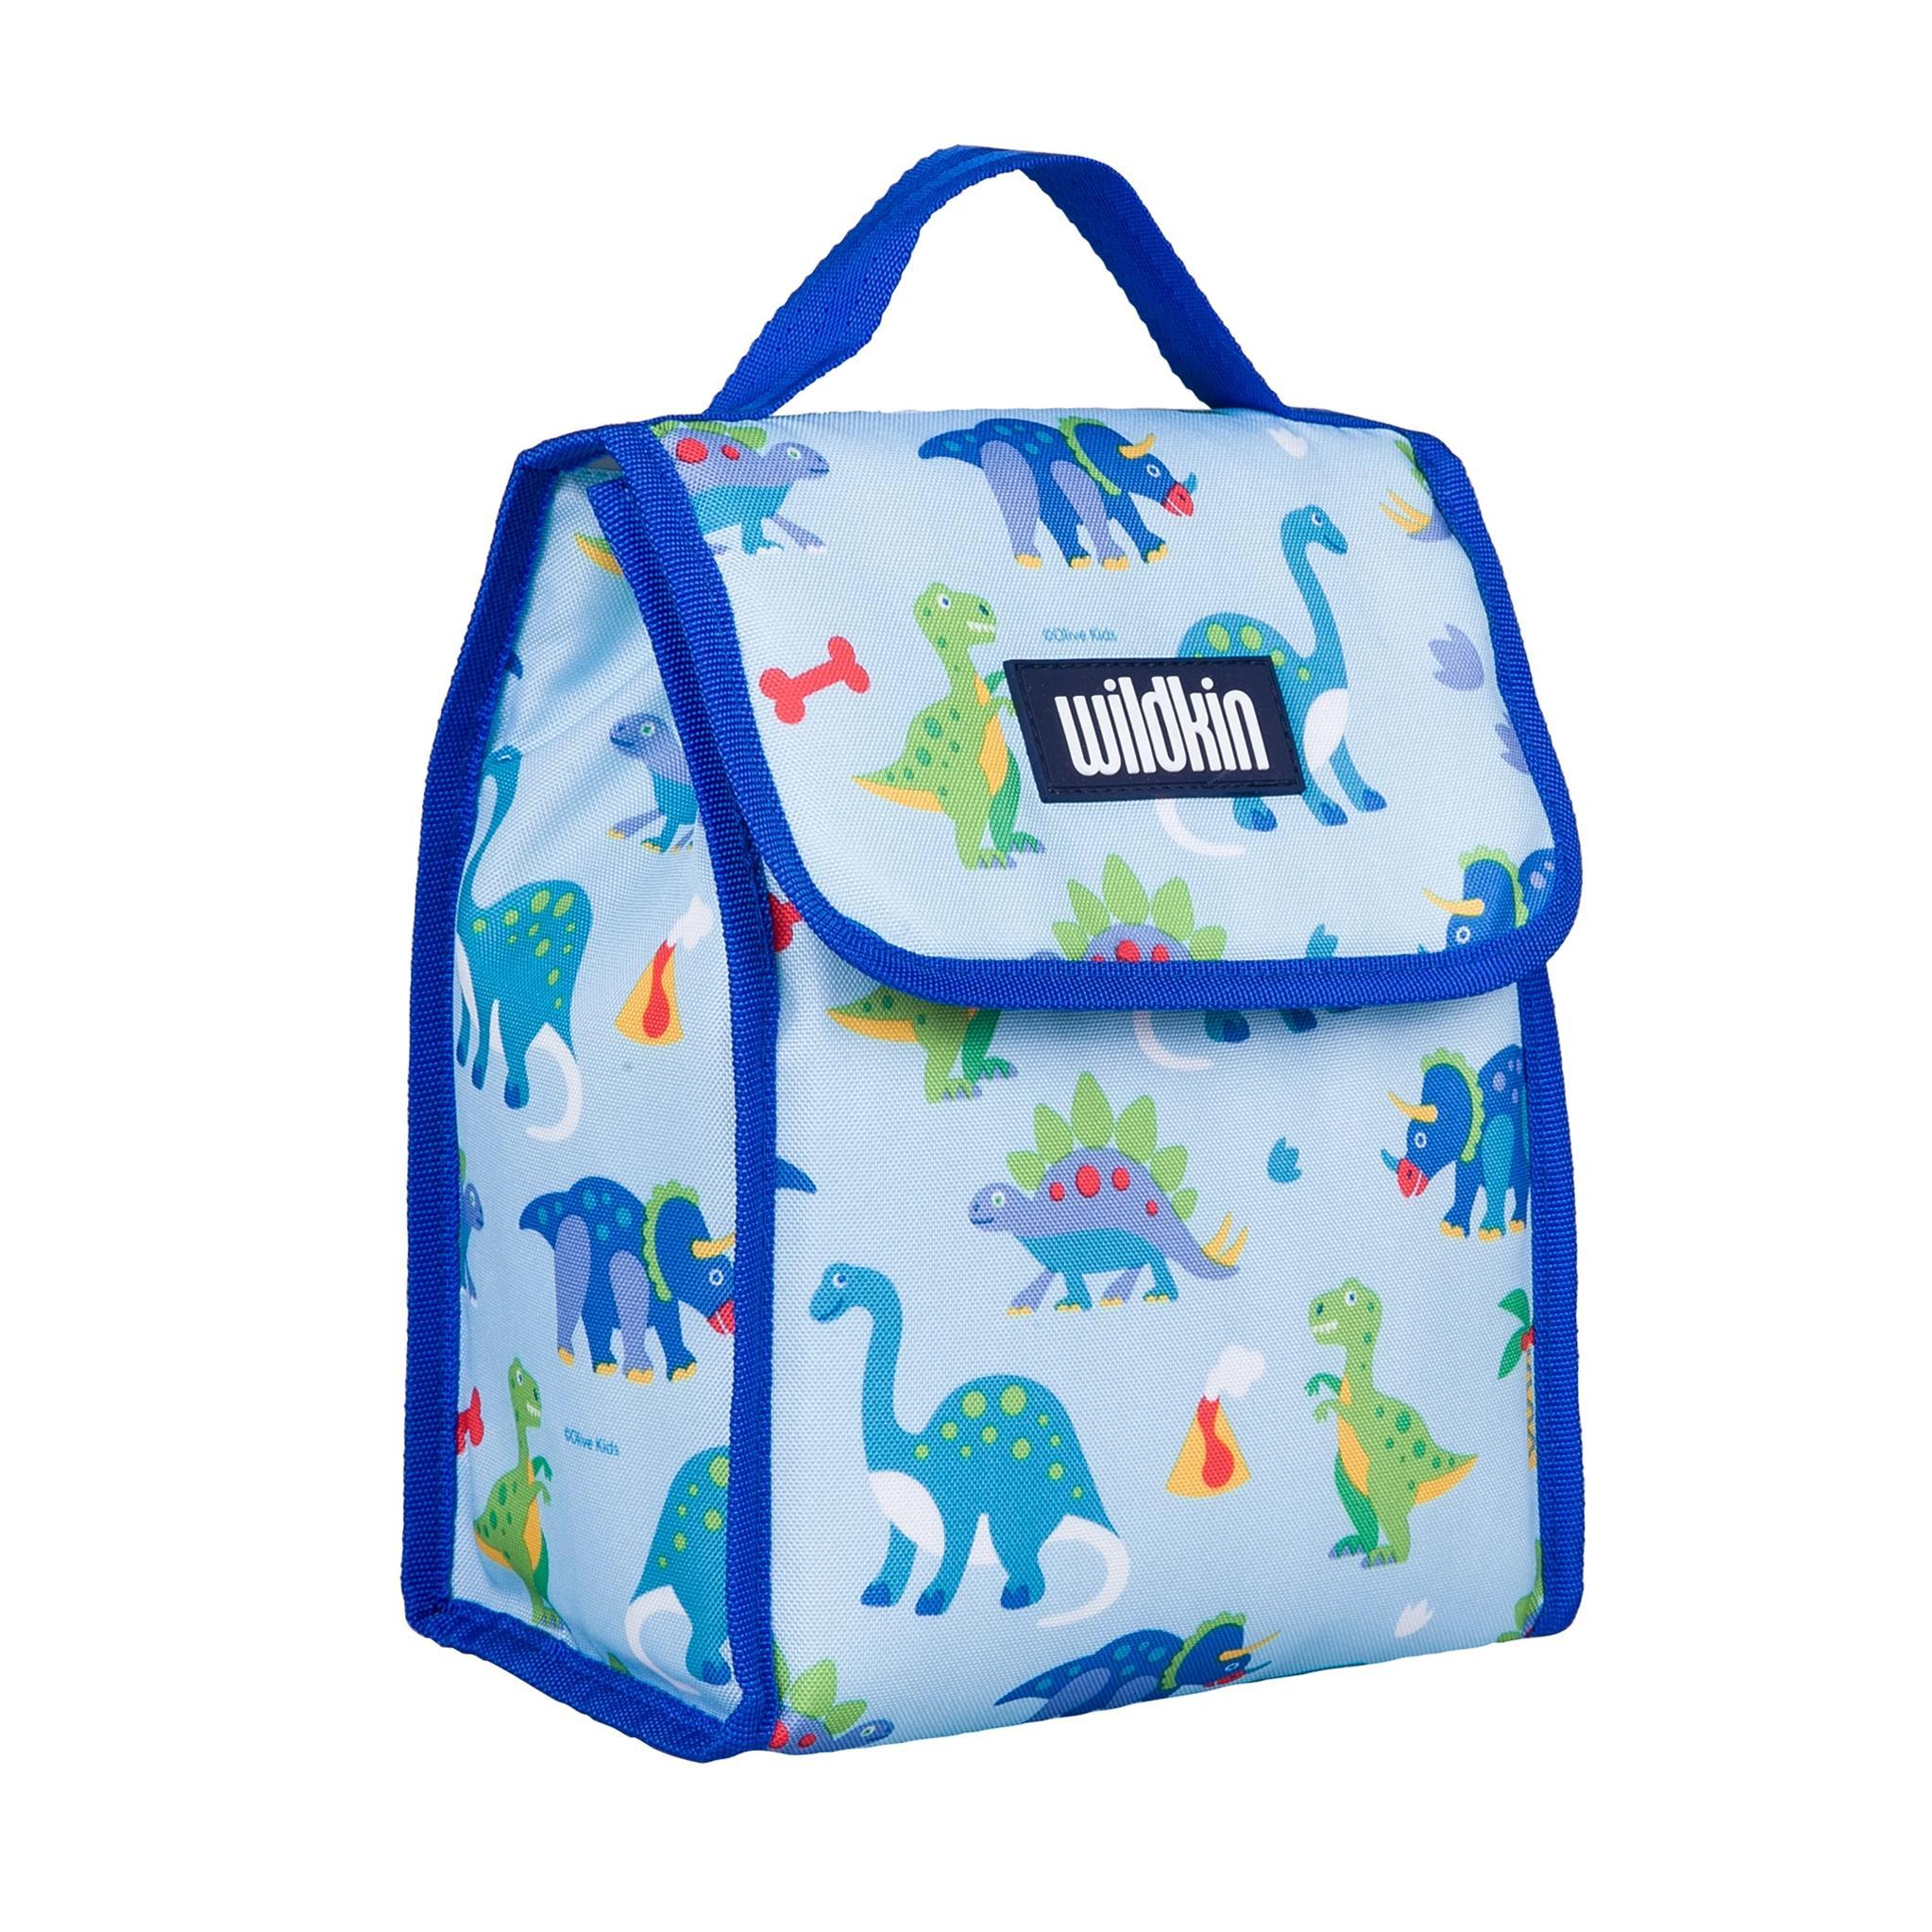 【LOVEBBB】符合CPSIA美國 Wildkin 55408 恐龍樂園 直立式午餐袋/便當袋/保溫袋(3歲以上)